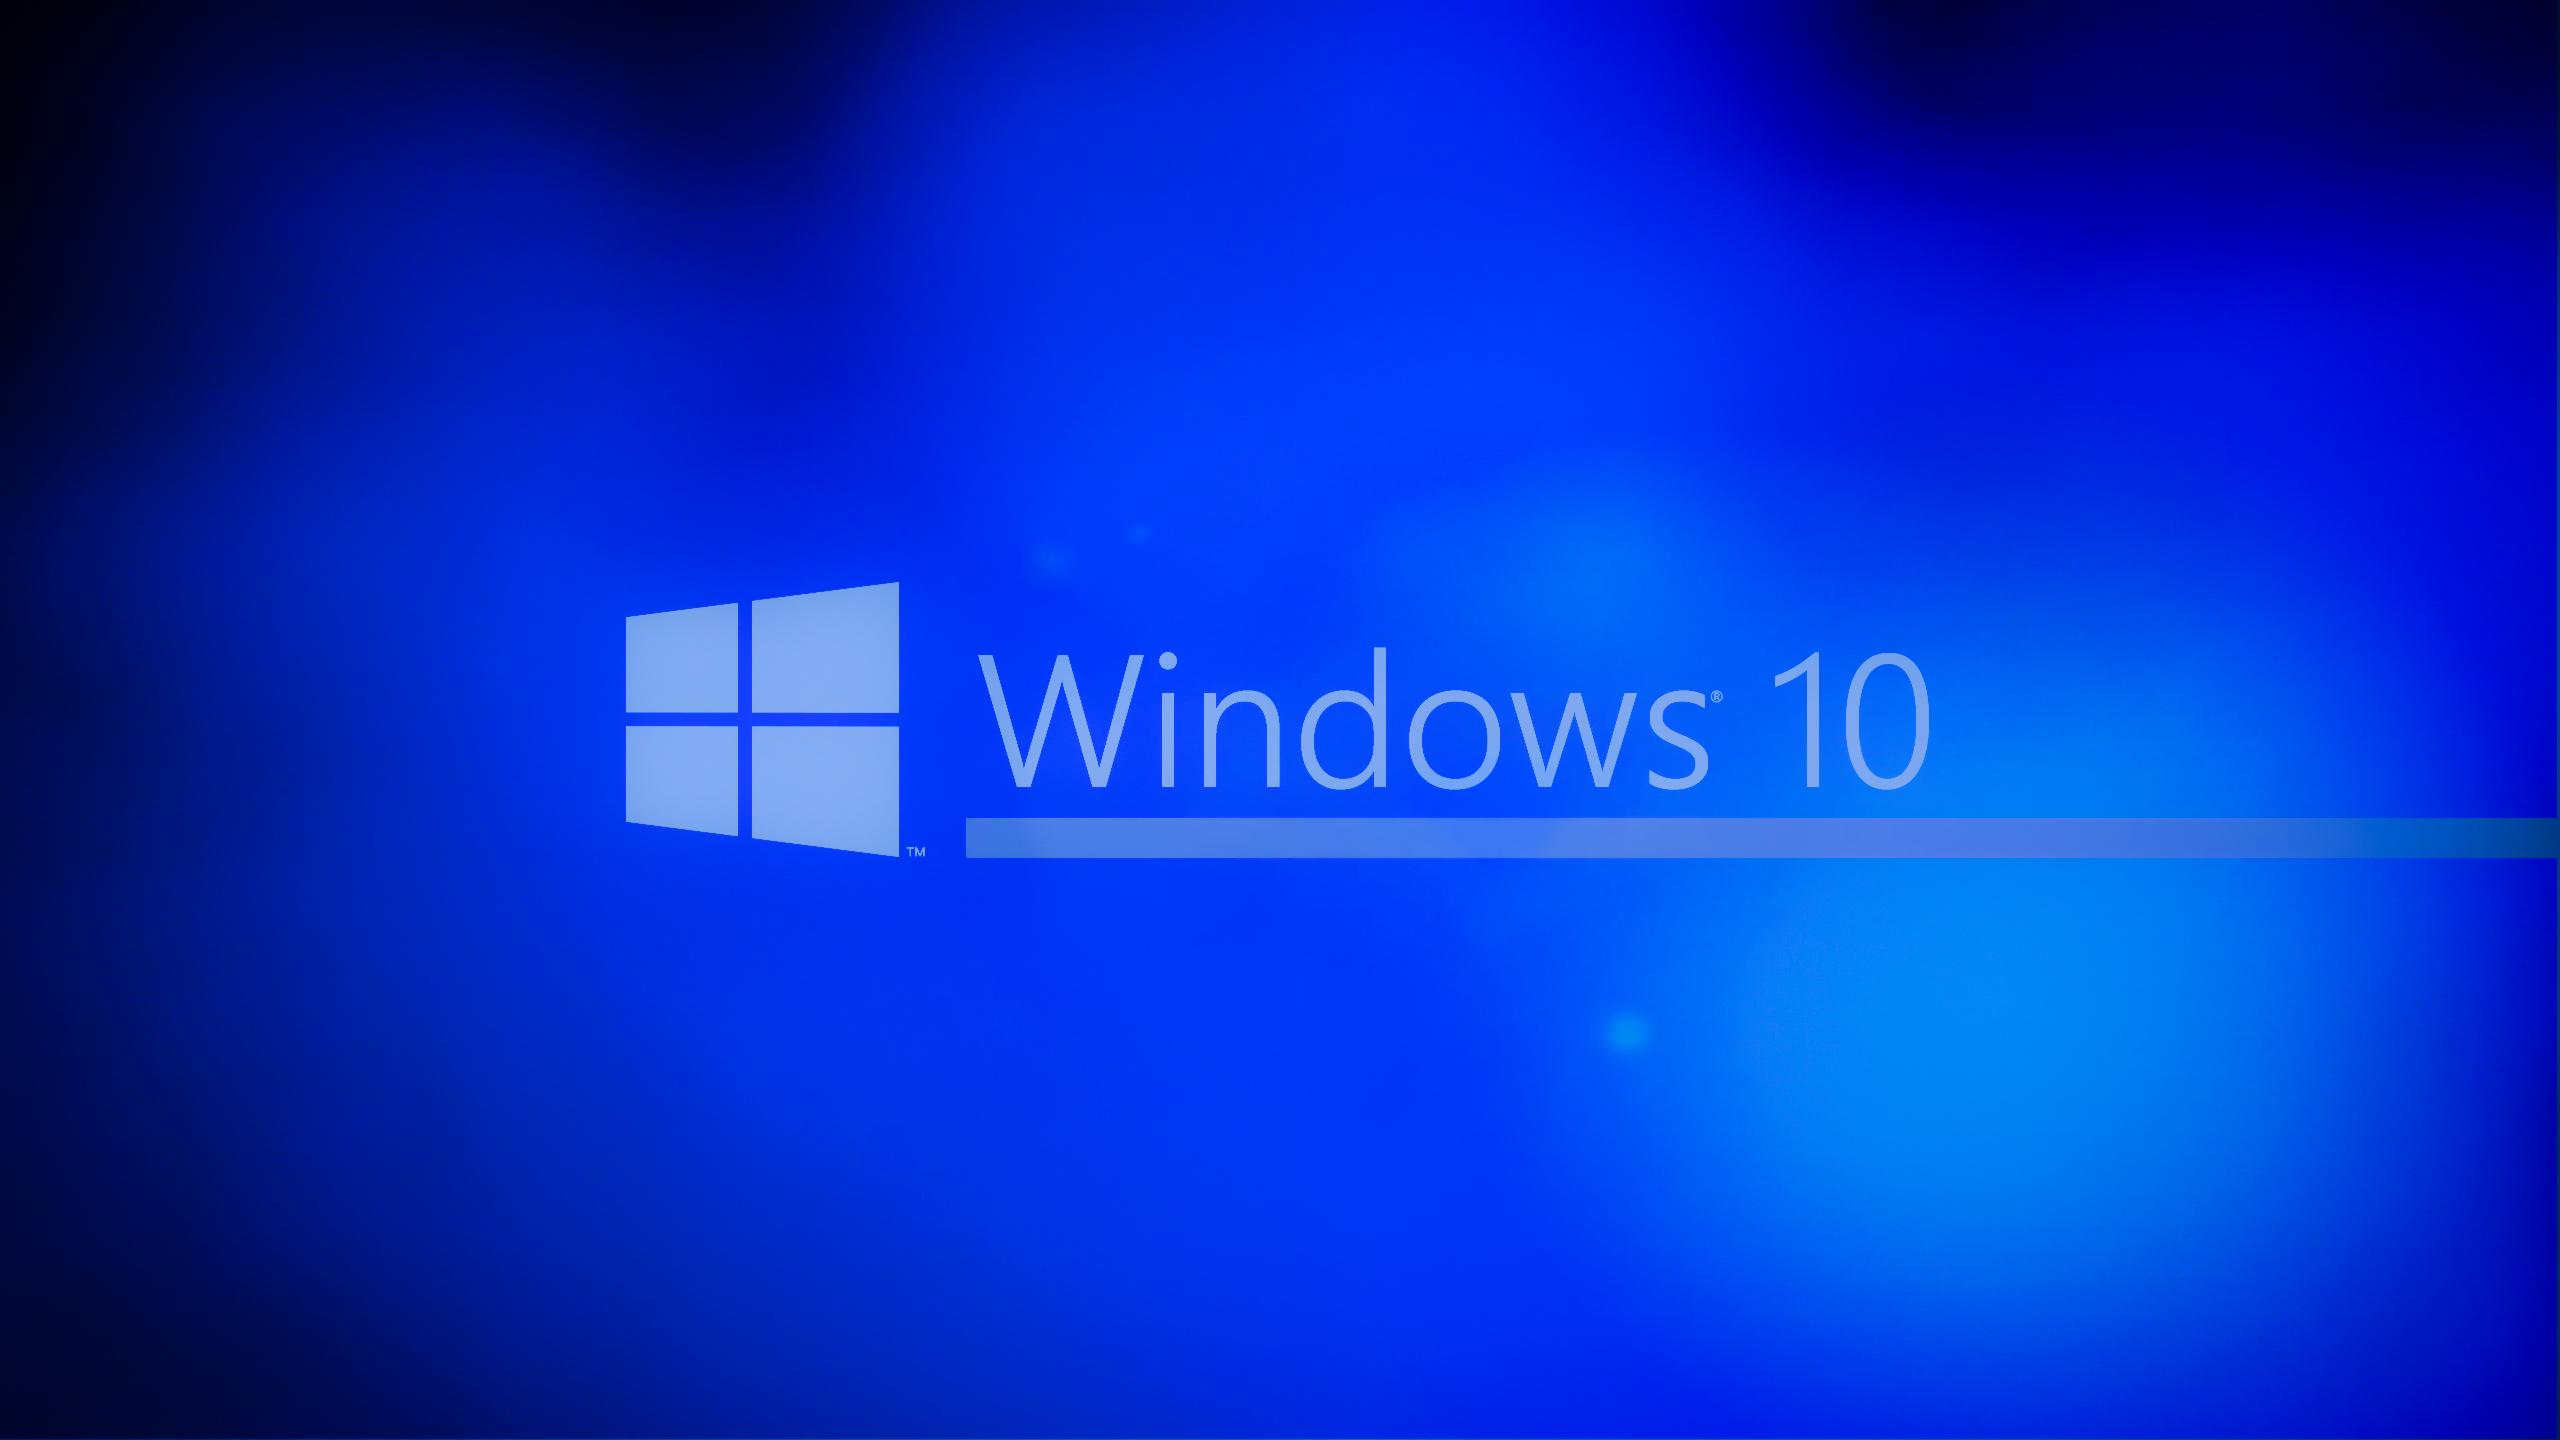 Free Download Windows 10 Wallpaper Logo Start Hd Wallpapers